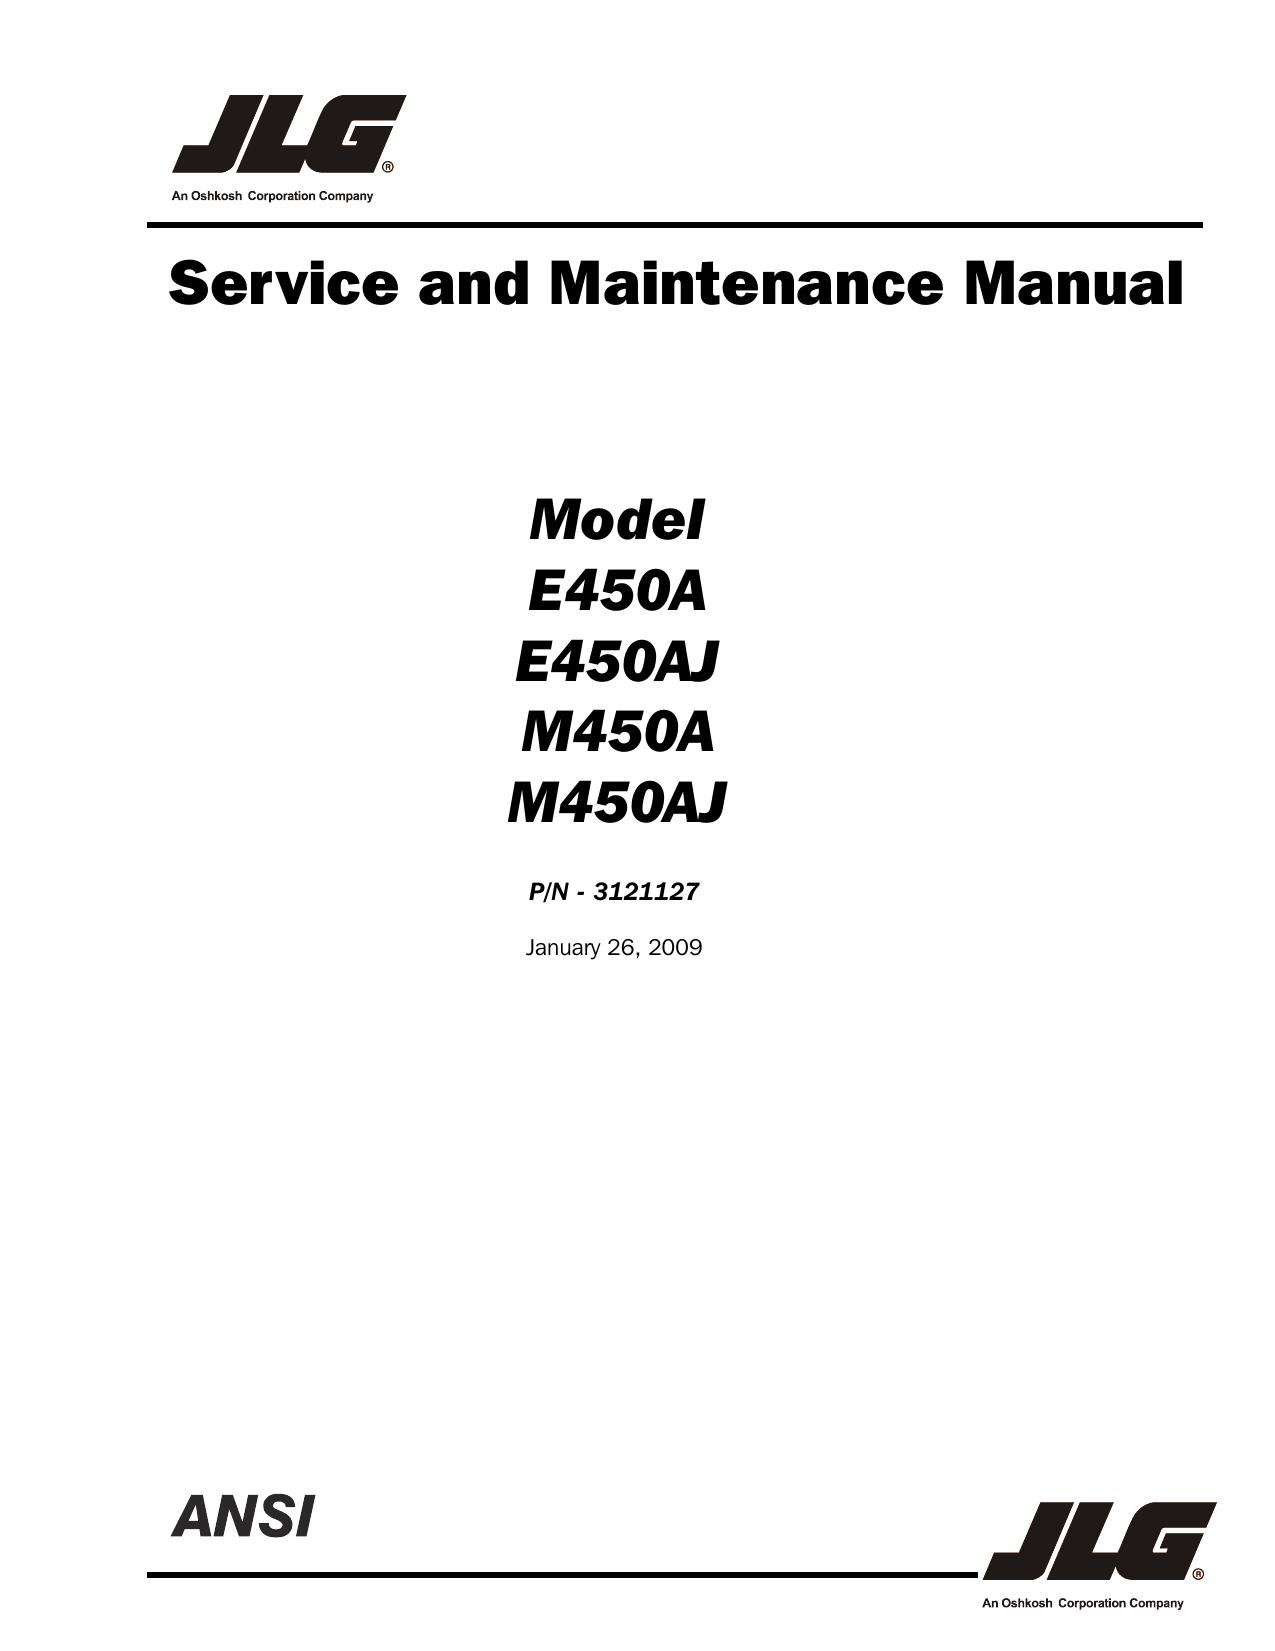 hight resolution of jlg e 450 wiring schematics wiring diagram for you jlg e 450 wiring schematics